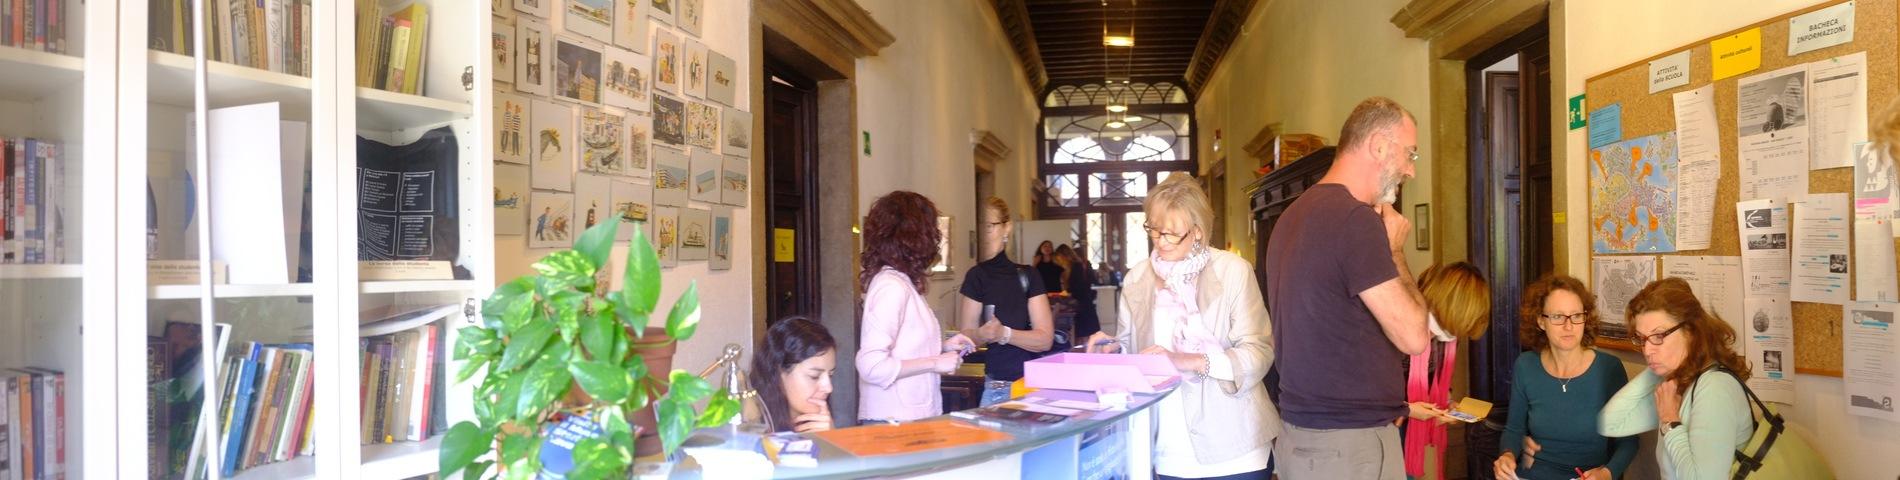 Venice Language School immagine 1